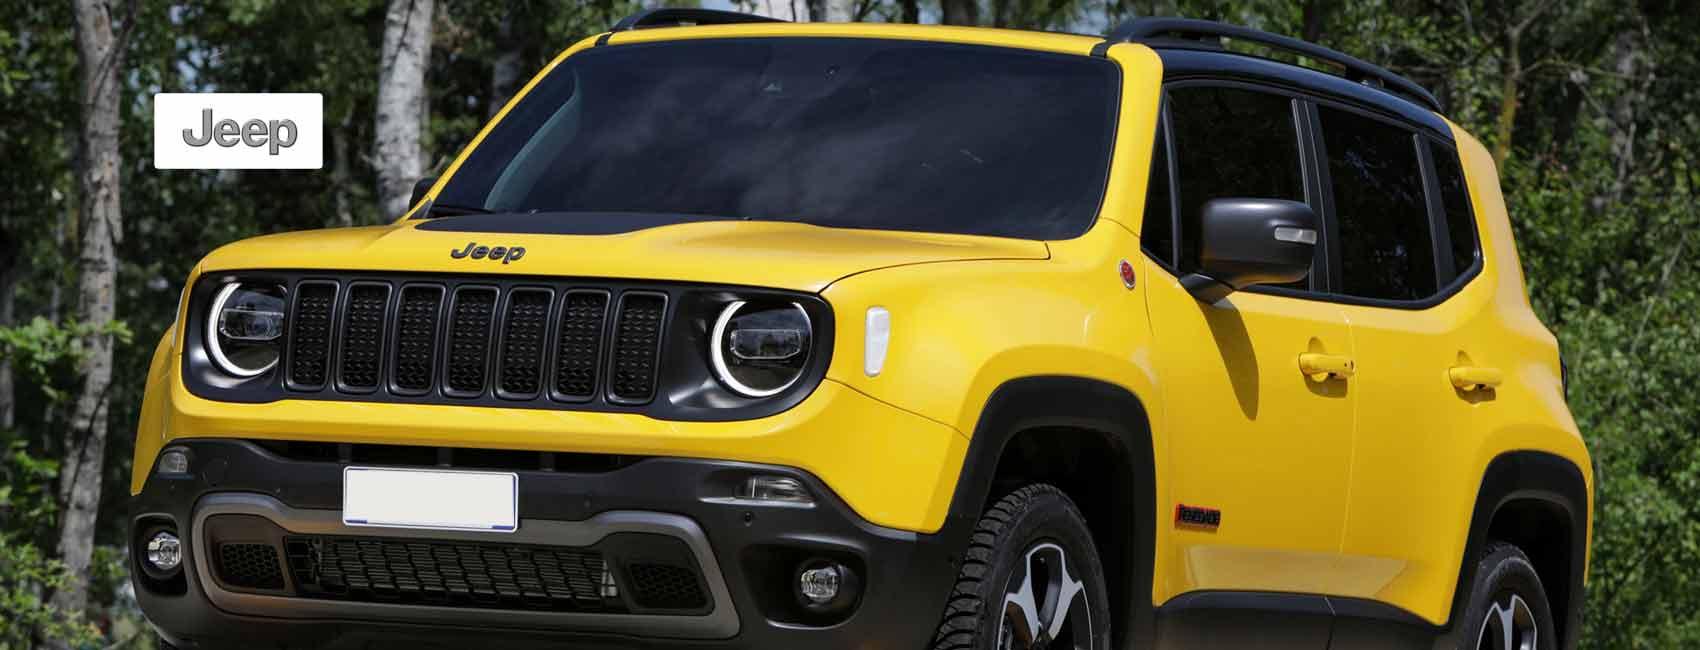 Used Jeep Parts - Buy Used Jeep OEM Parts Online @ Best Price